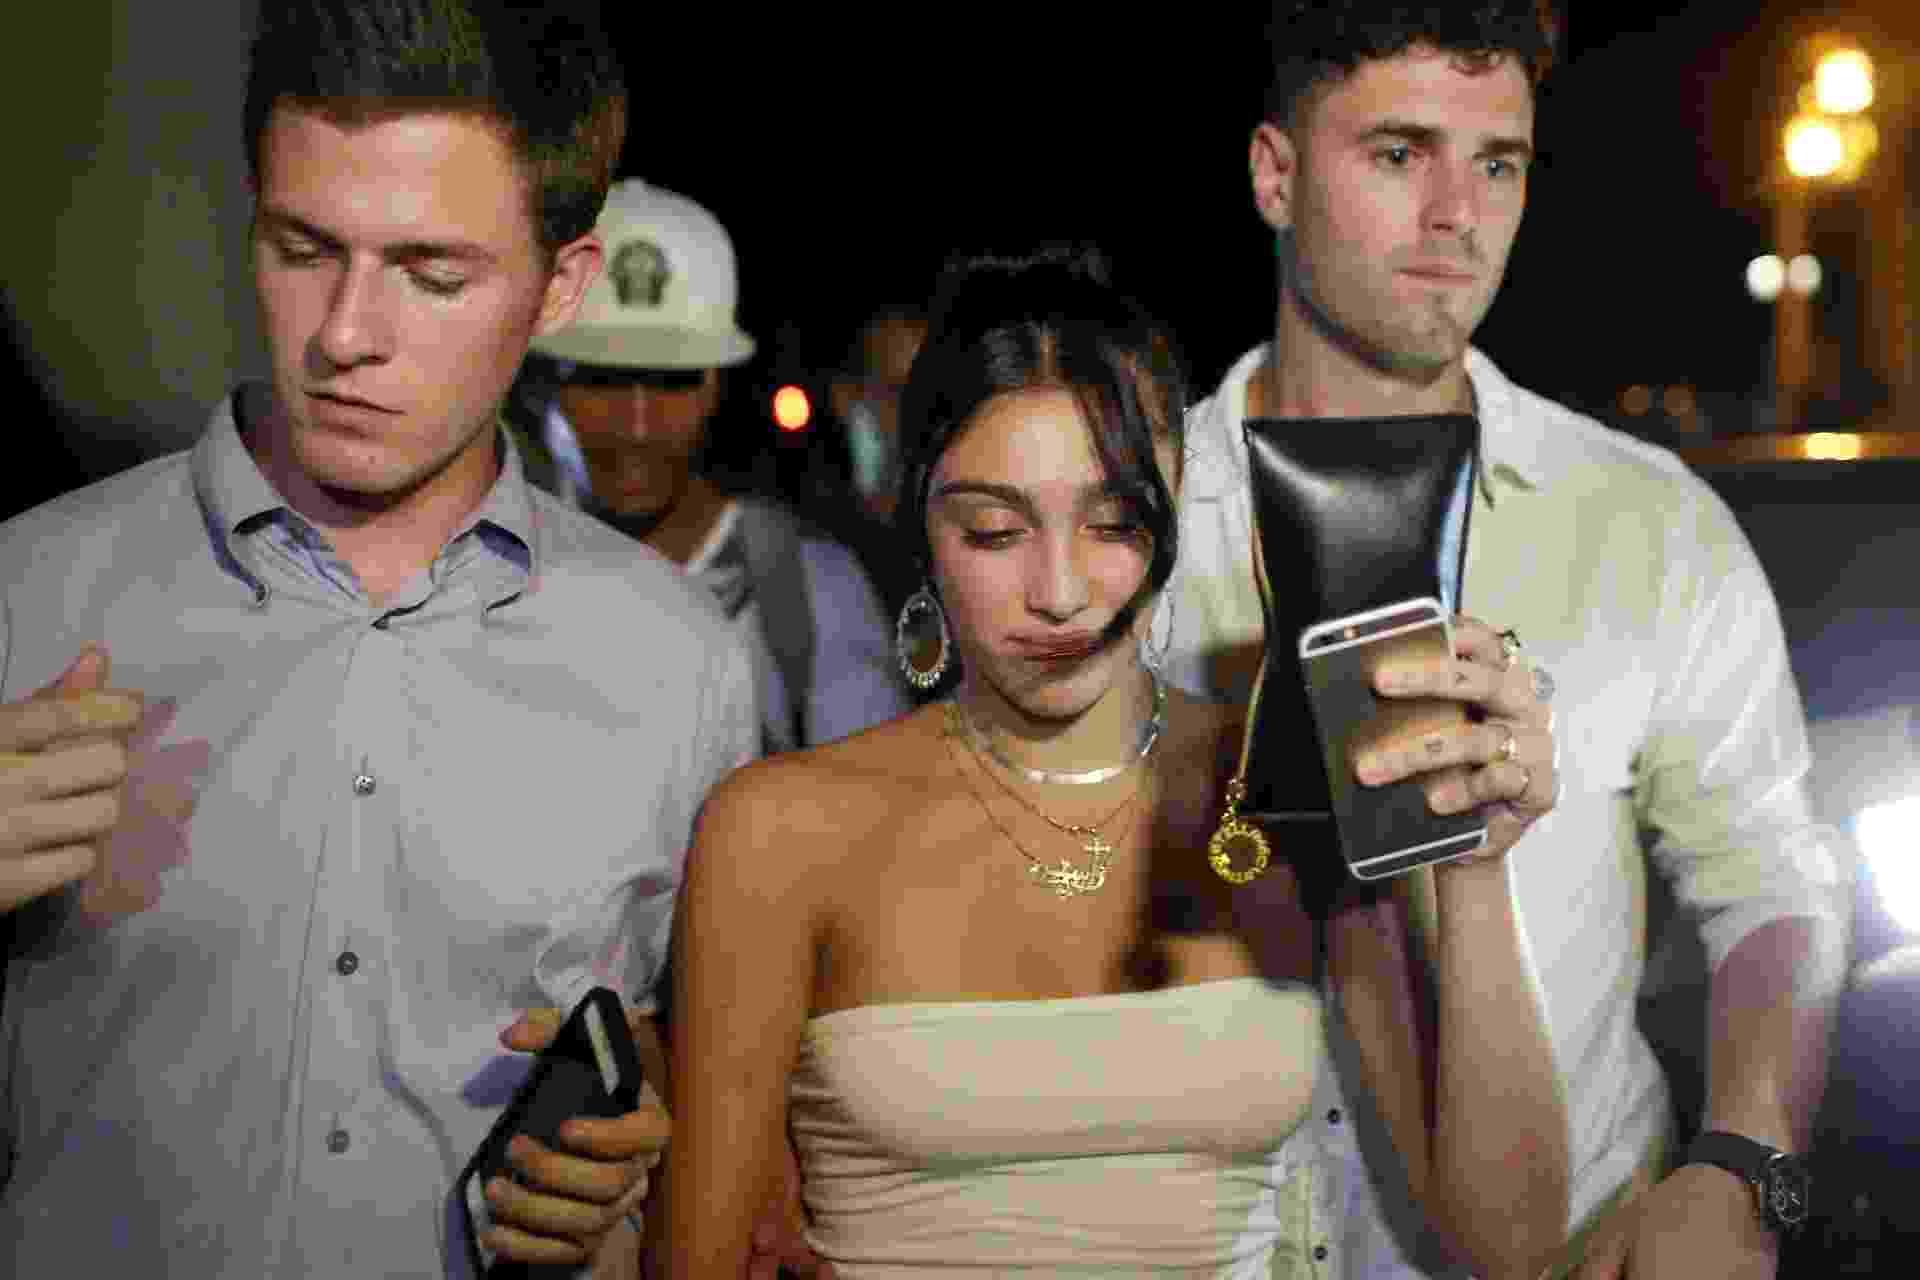 15.ago.2016 - Cercada por seguranças, Lourdes Leon deixa hotel para passear por Havana - Reuters